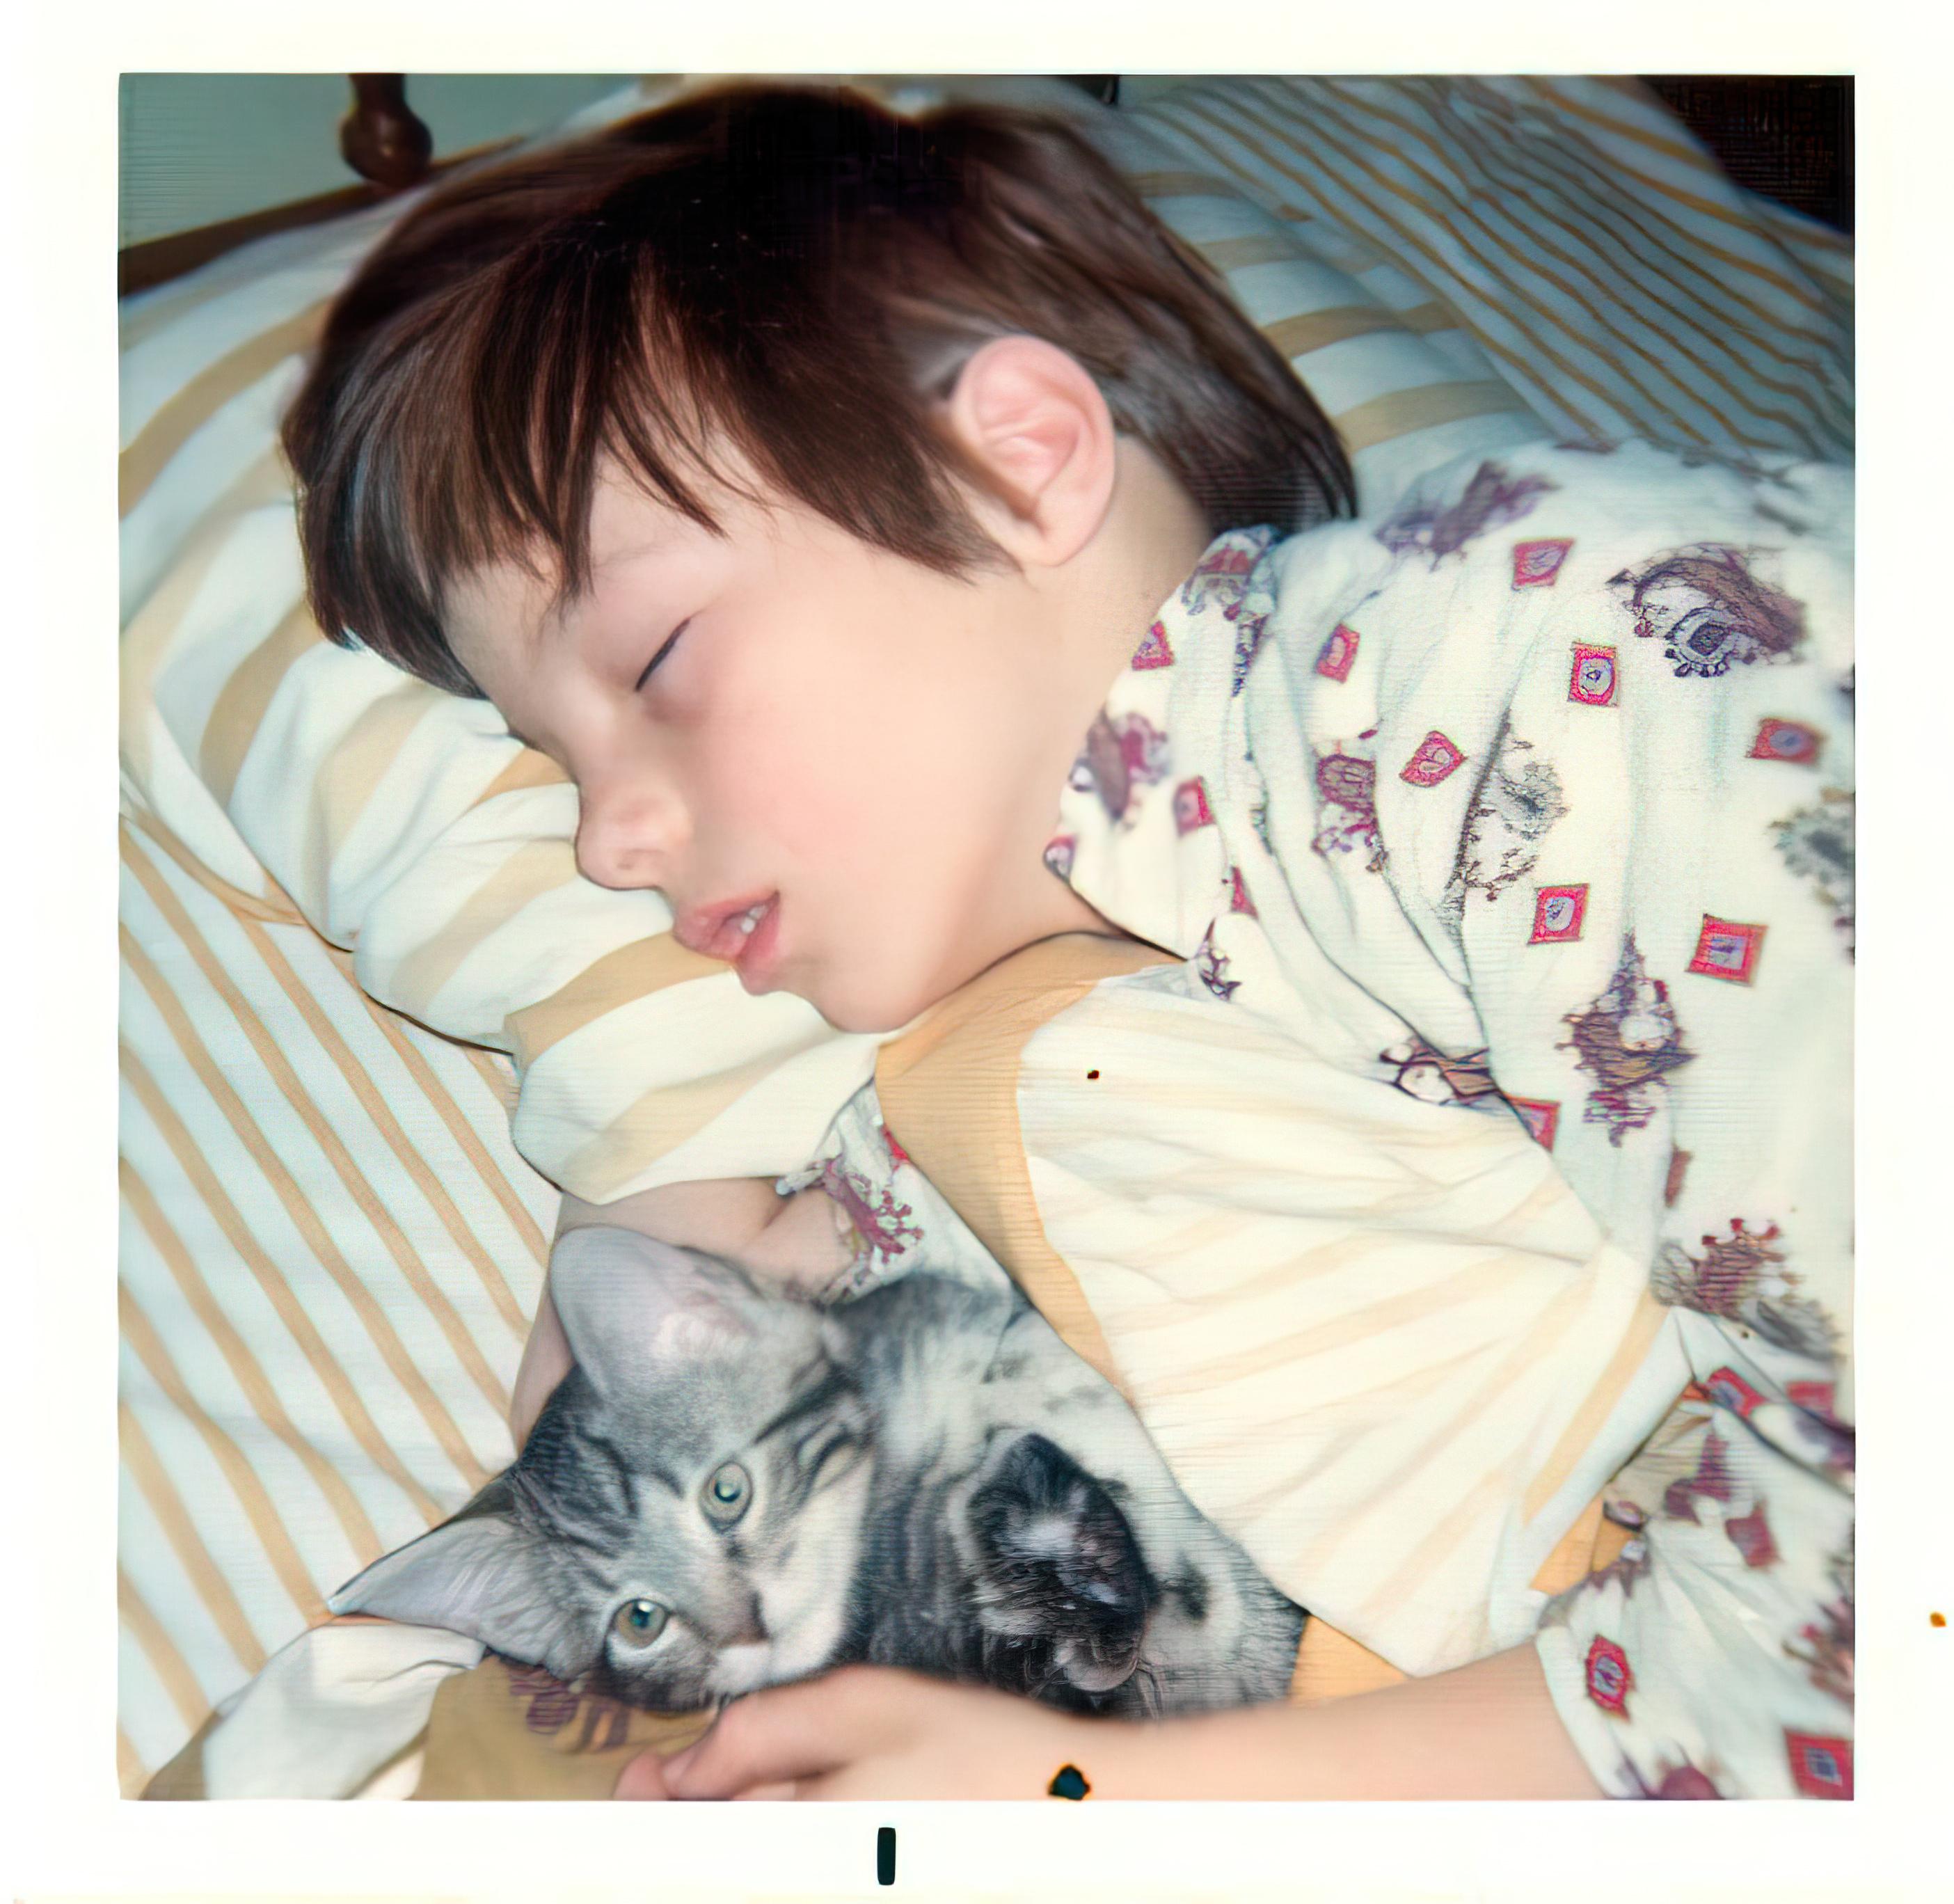 David Boles as Sleeping Beauty